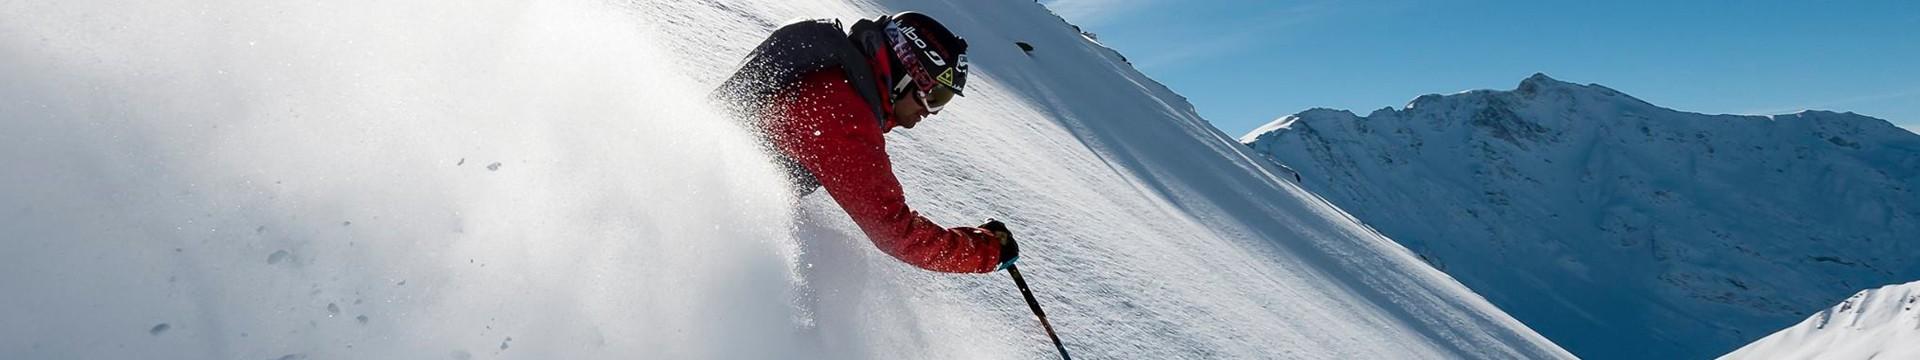 ski-06-8841